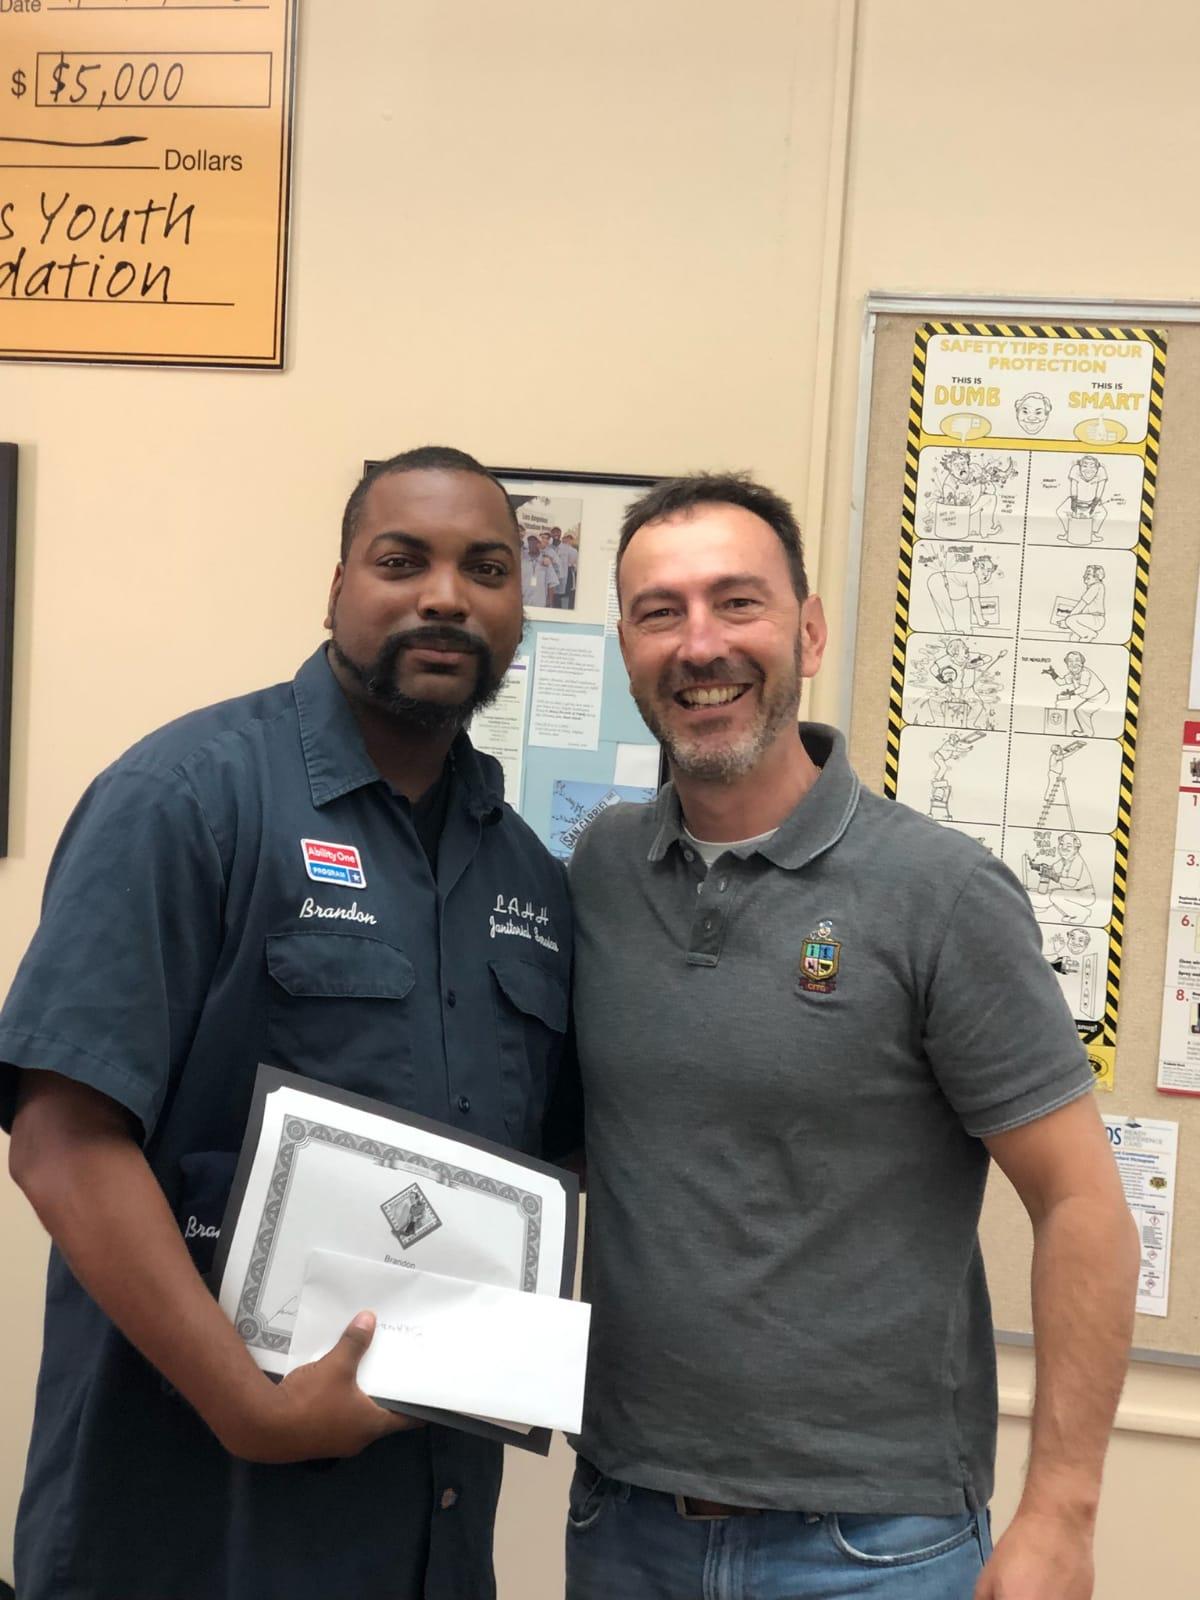 Brandon receives the Vacuum Specialist Certificate